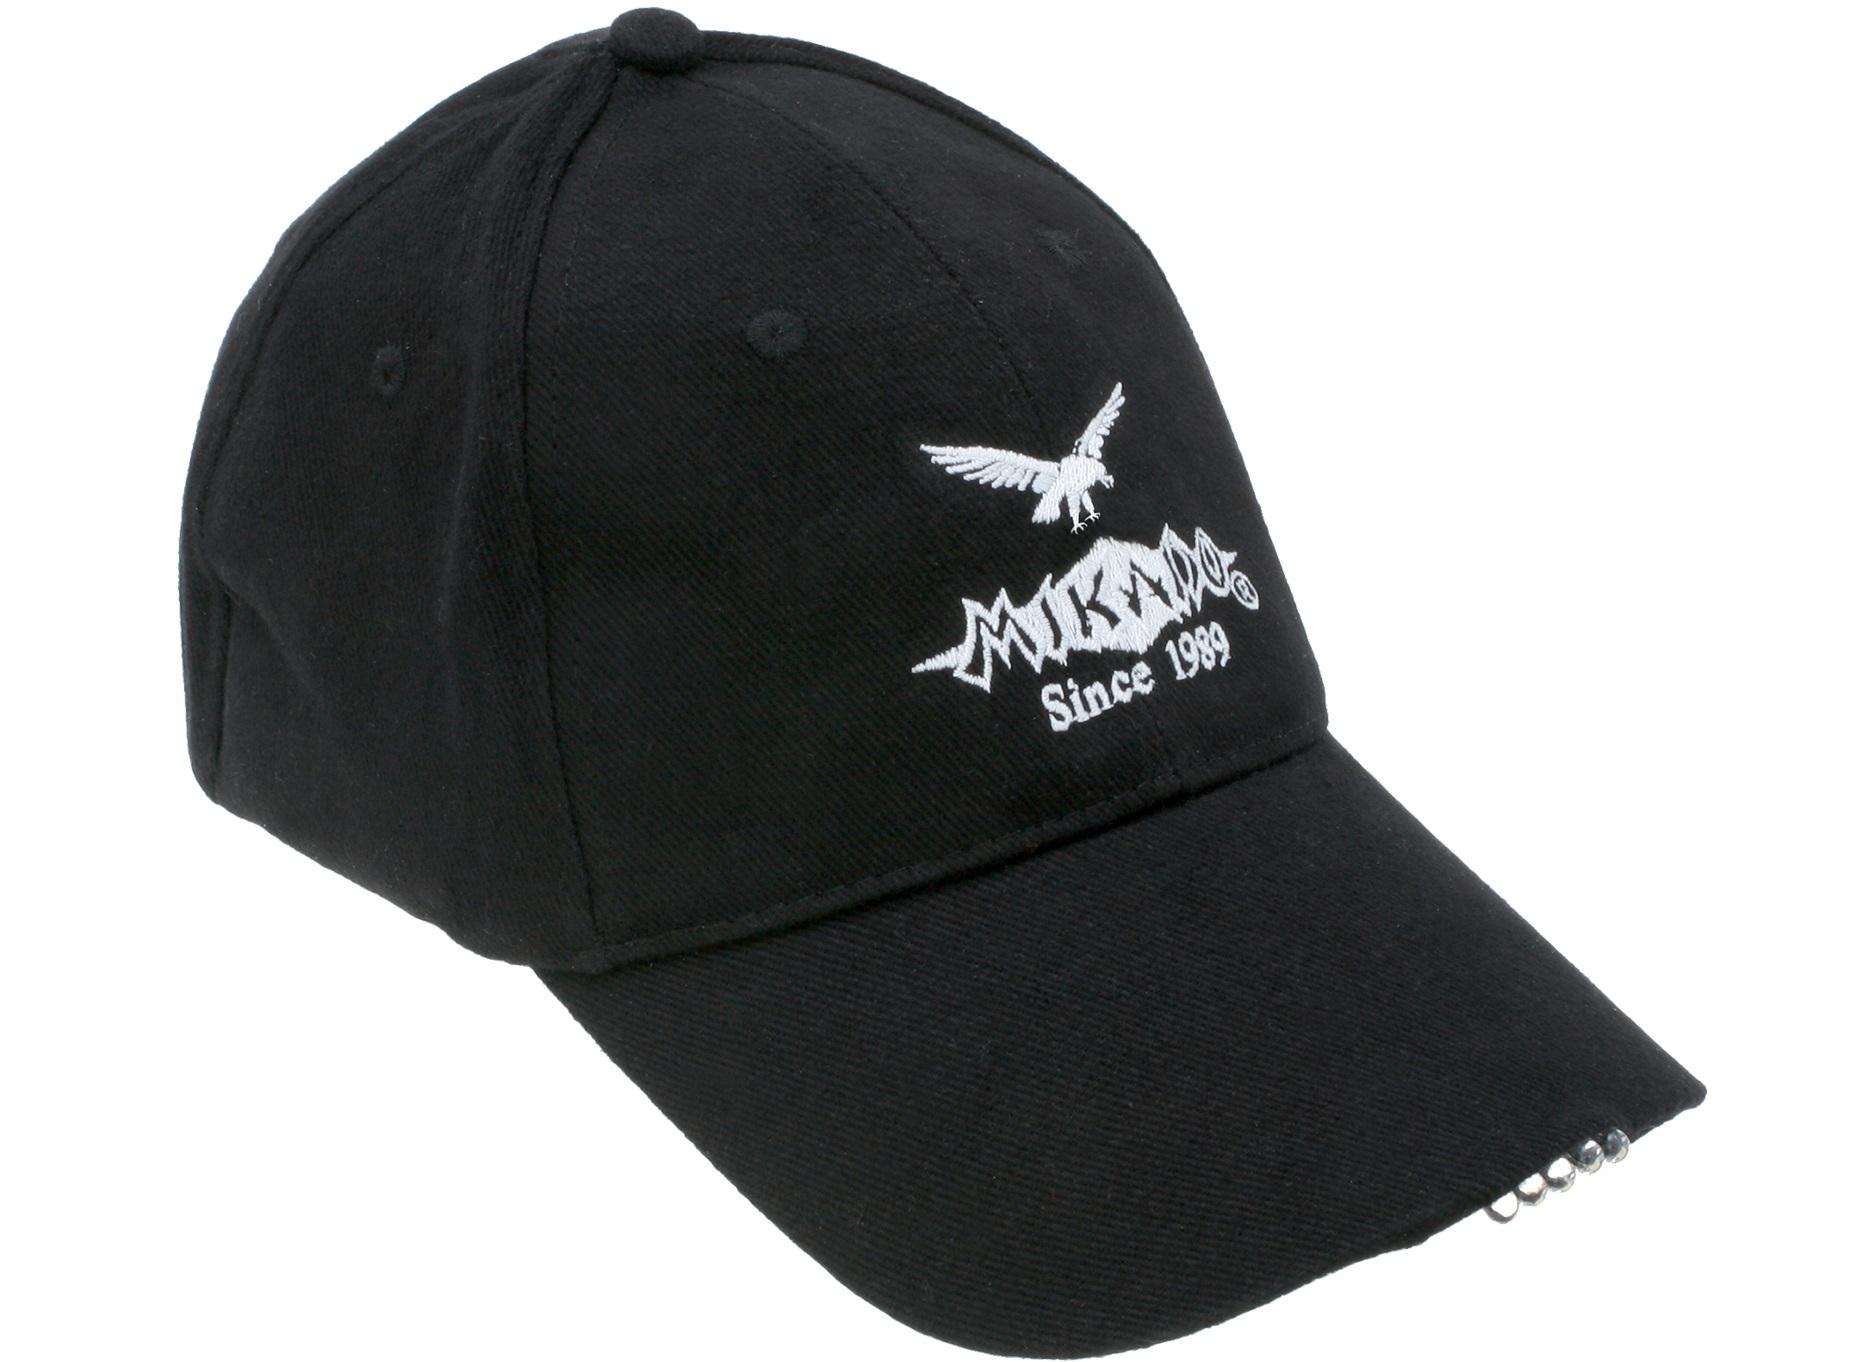 Бейсболка Mikado UM ULED01 BK, черная,